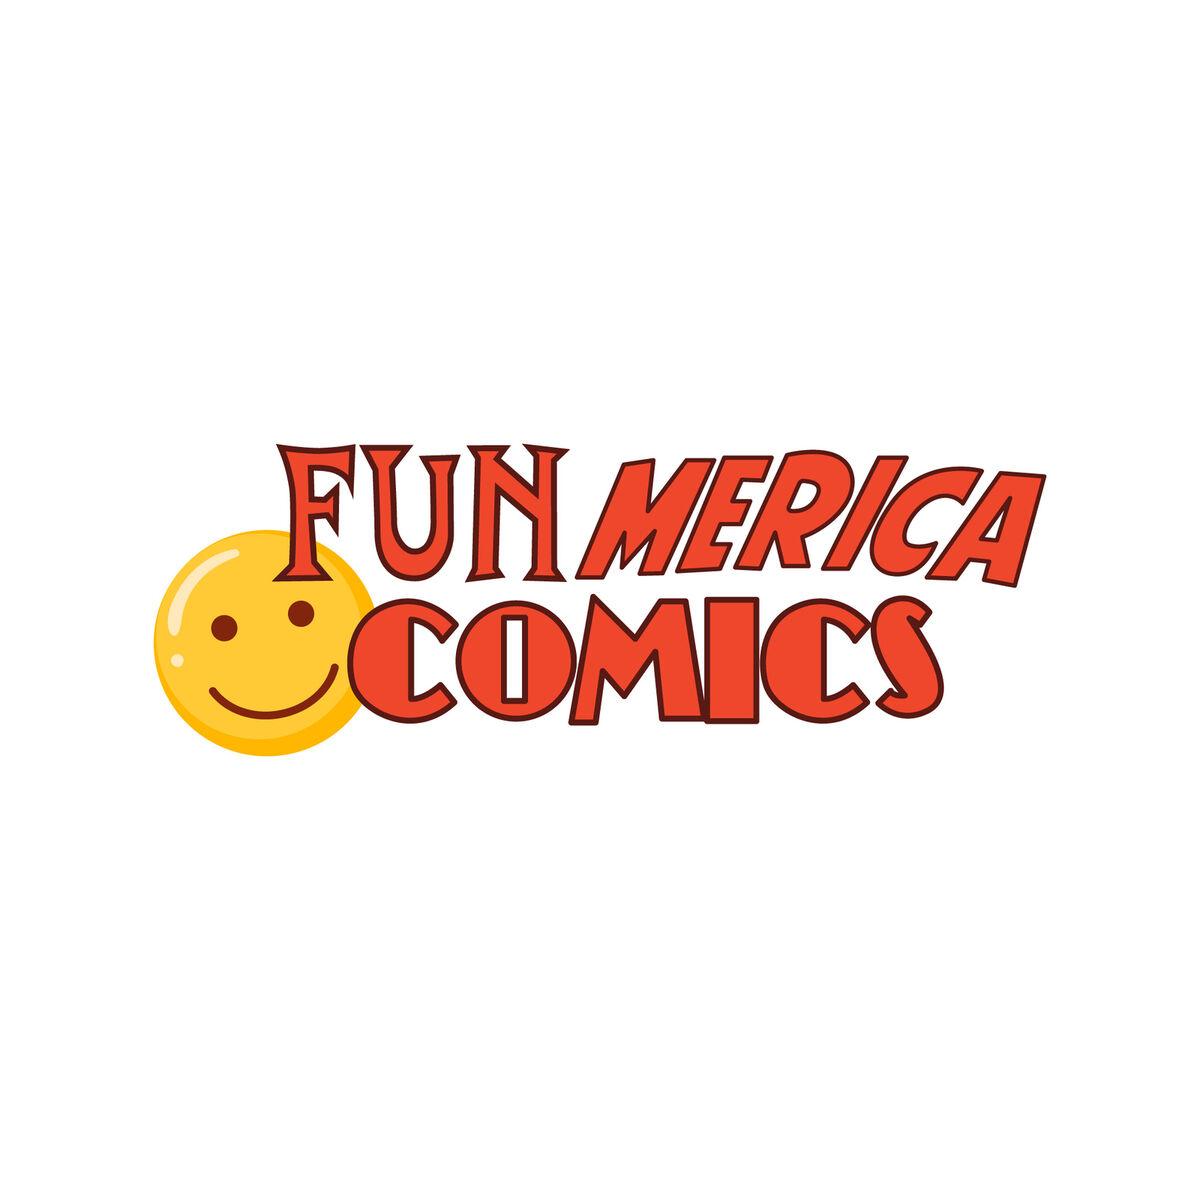 FUNmerica Comics